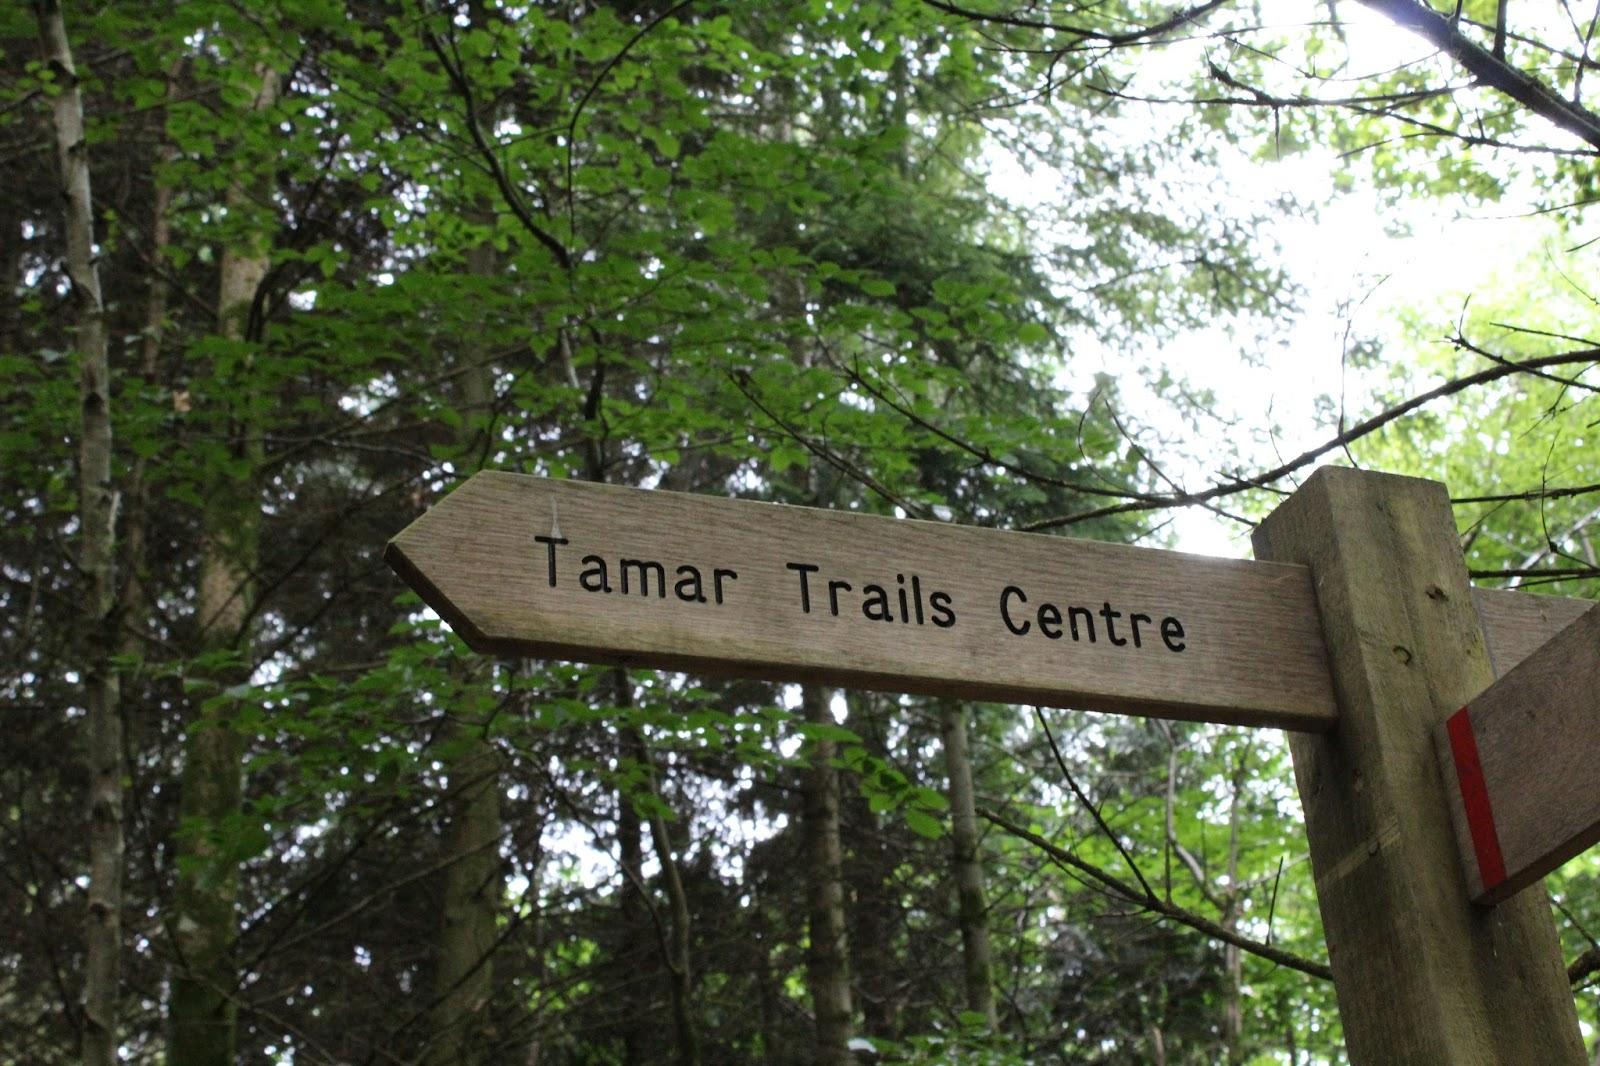 Tamar-Trails-centre